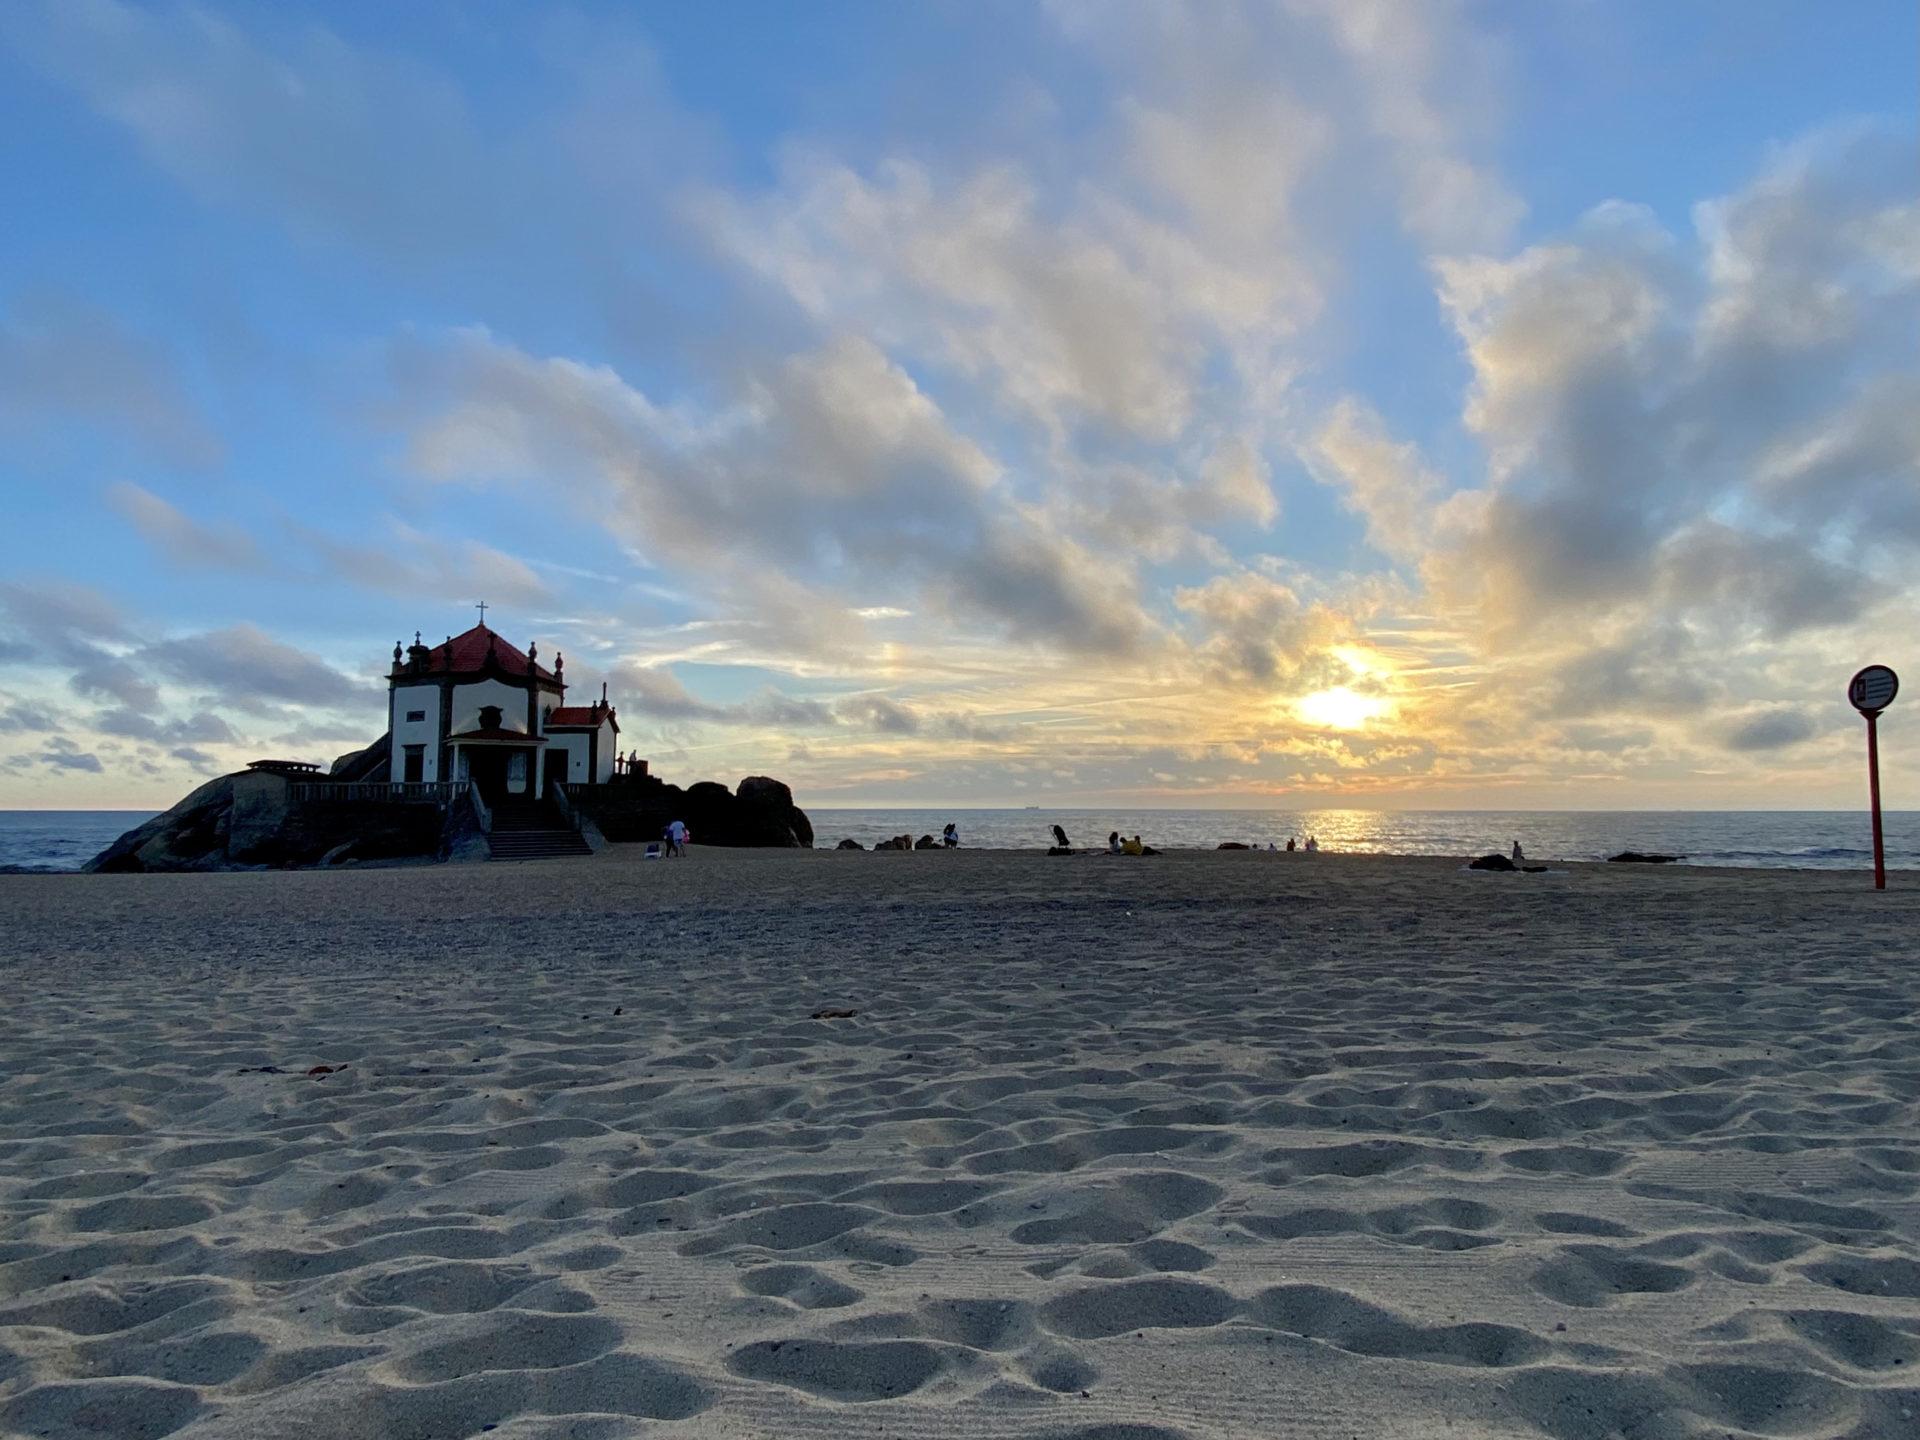 igreja beira mar portugal